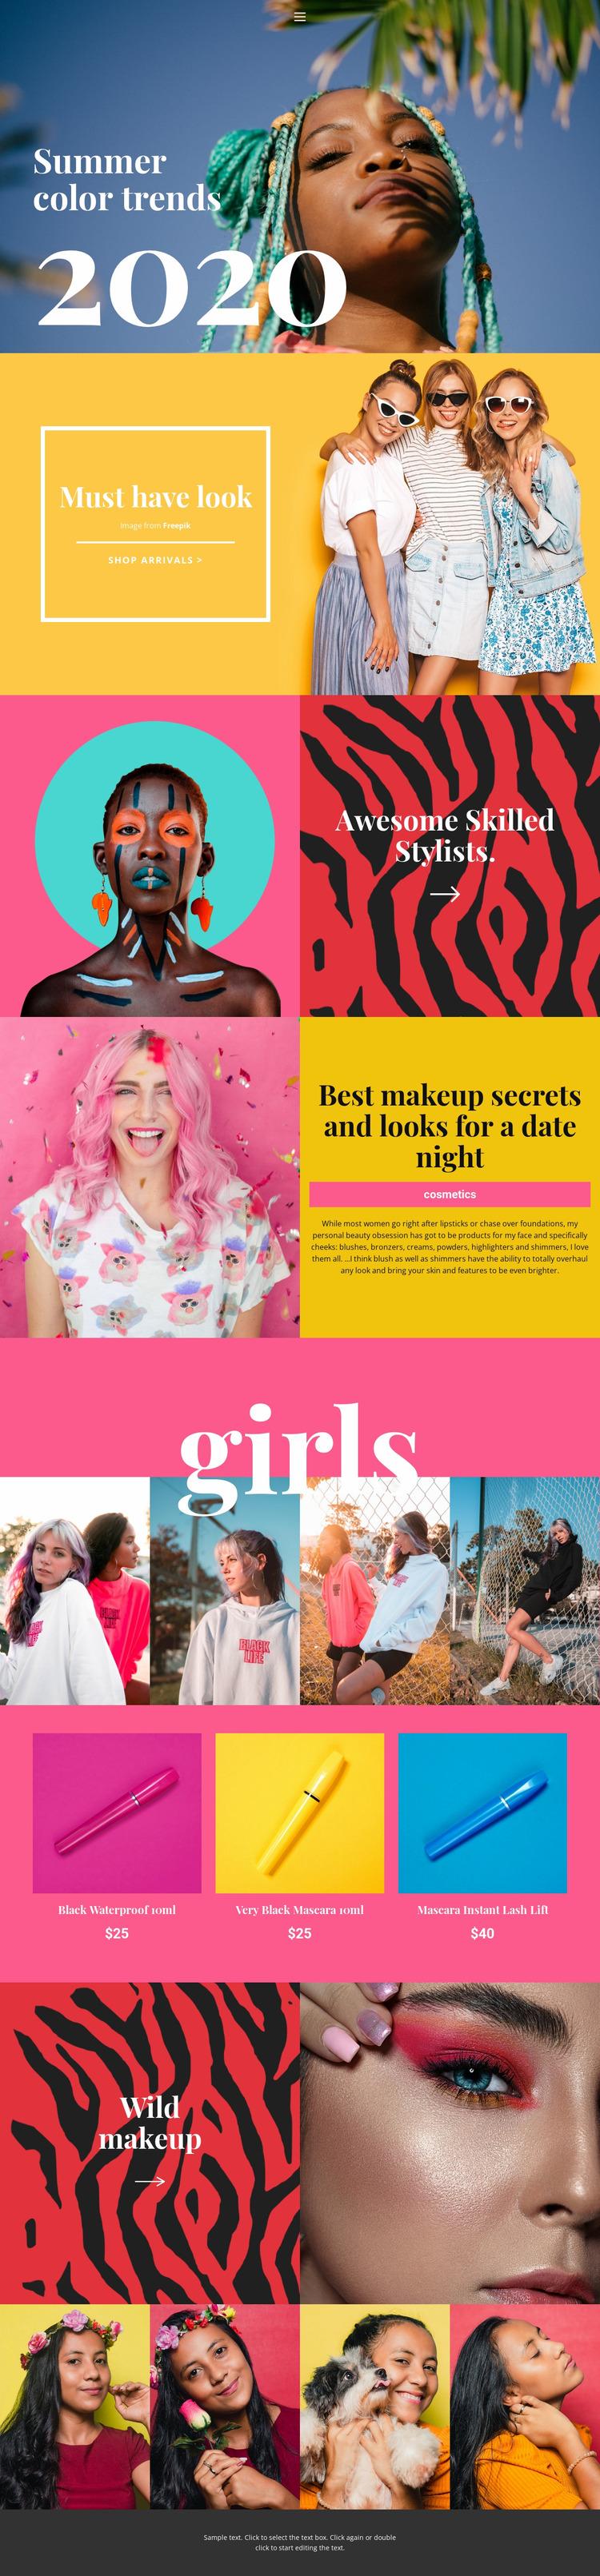 Beauty trends info Html Website Builder